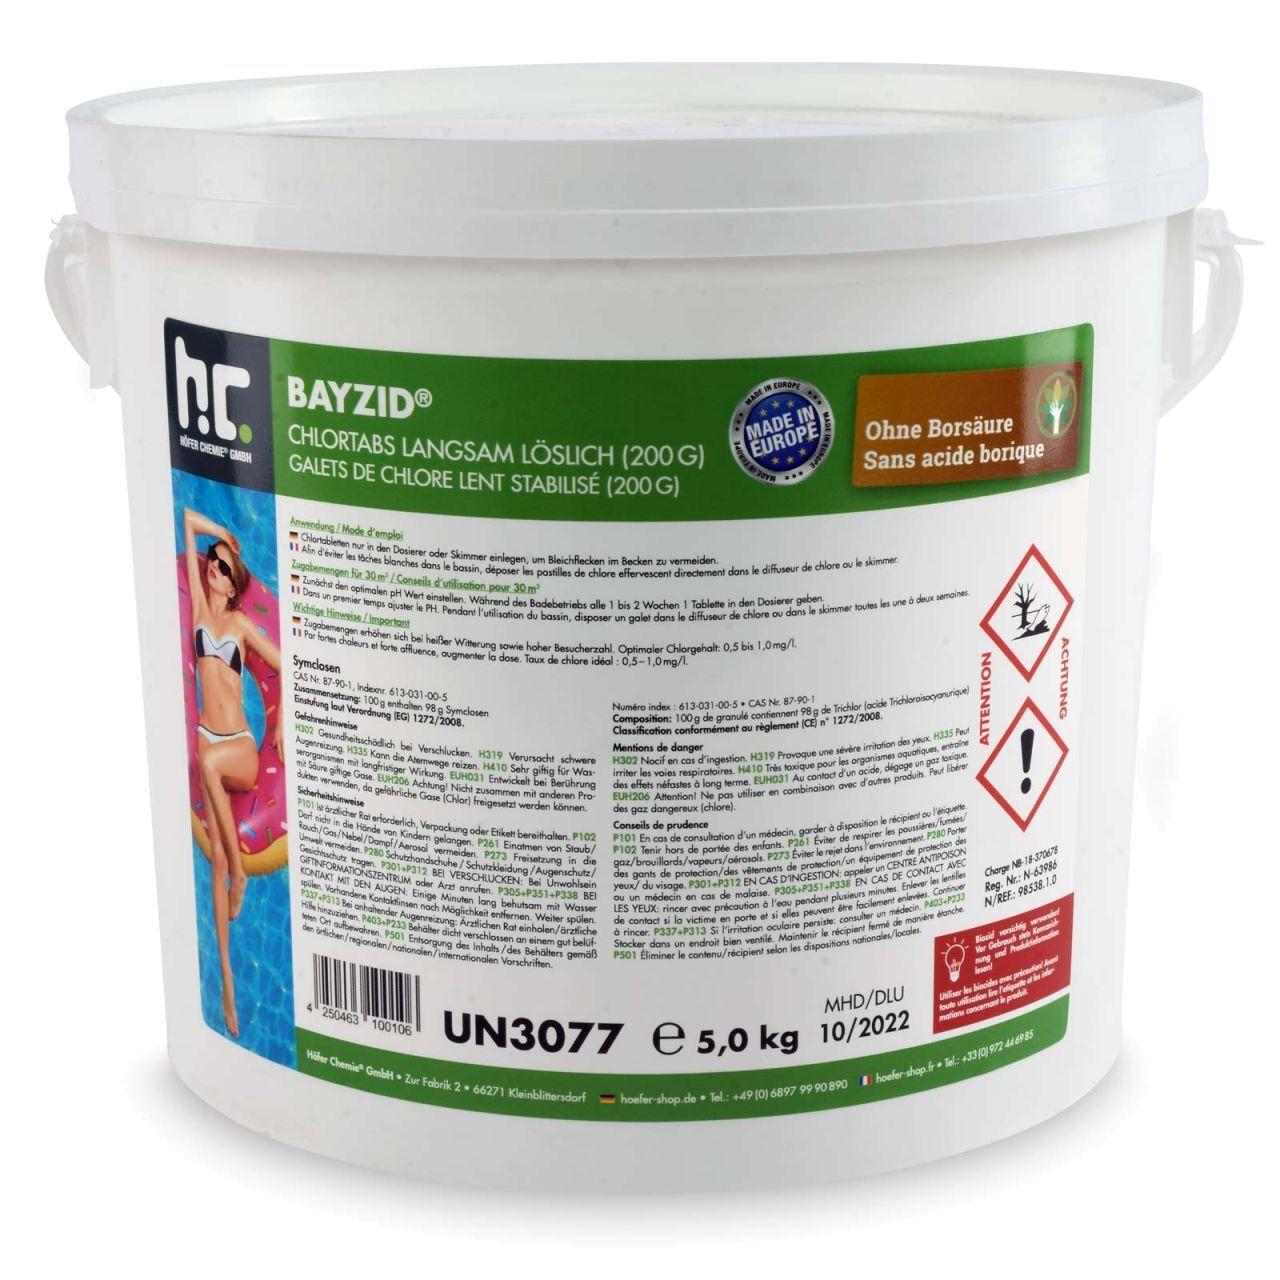 BAYZID 20 kg Bayzid® Galets de chlore lent (200g) (4 x 5 kg)